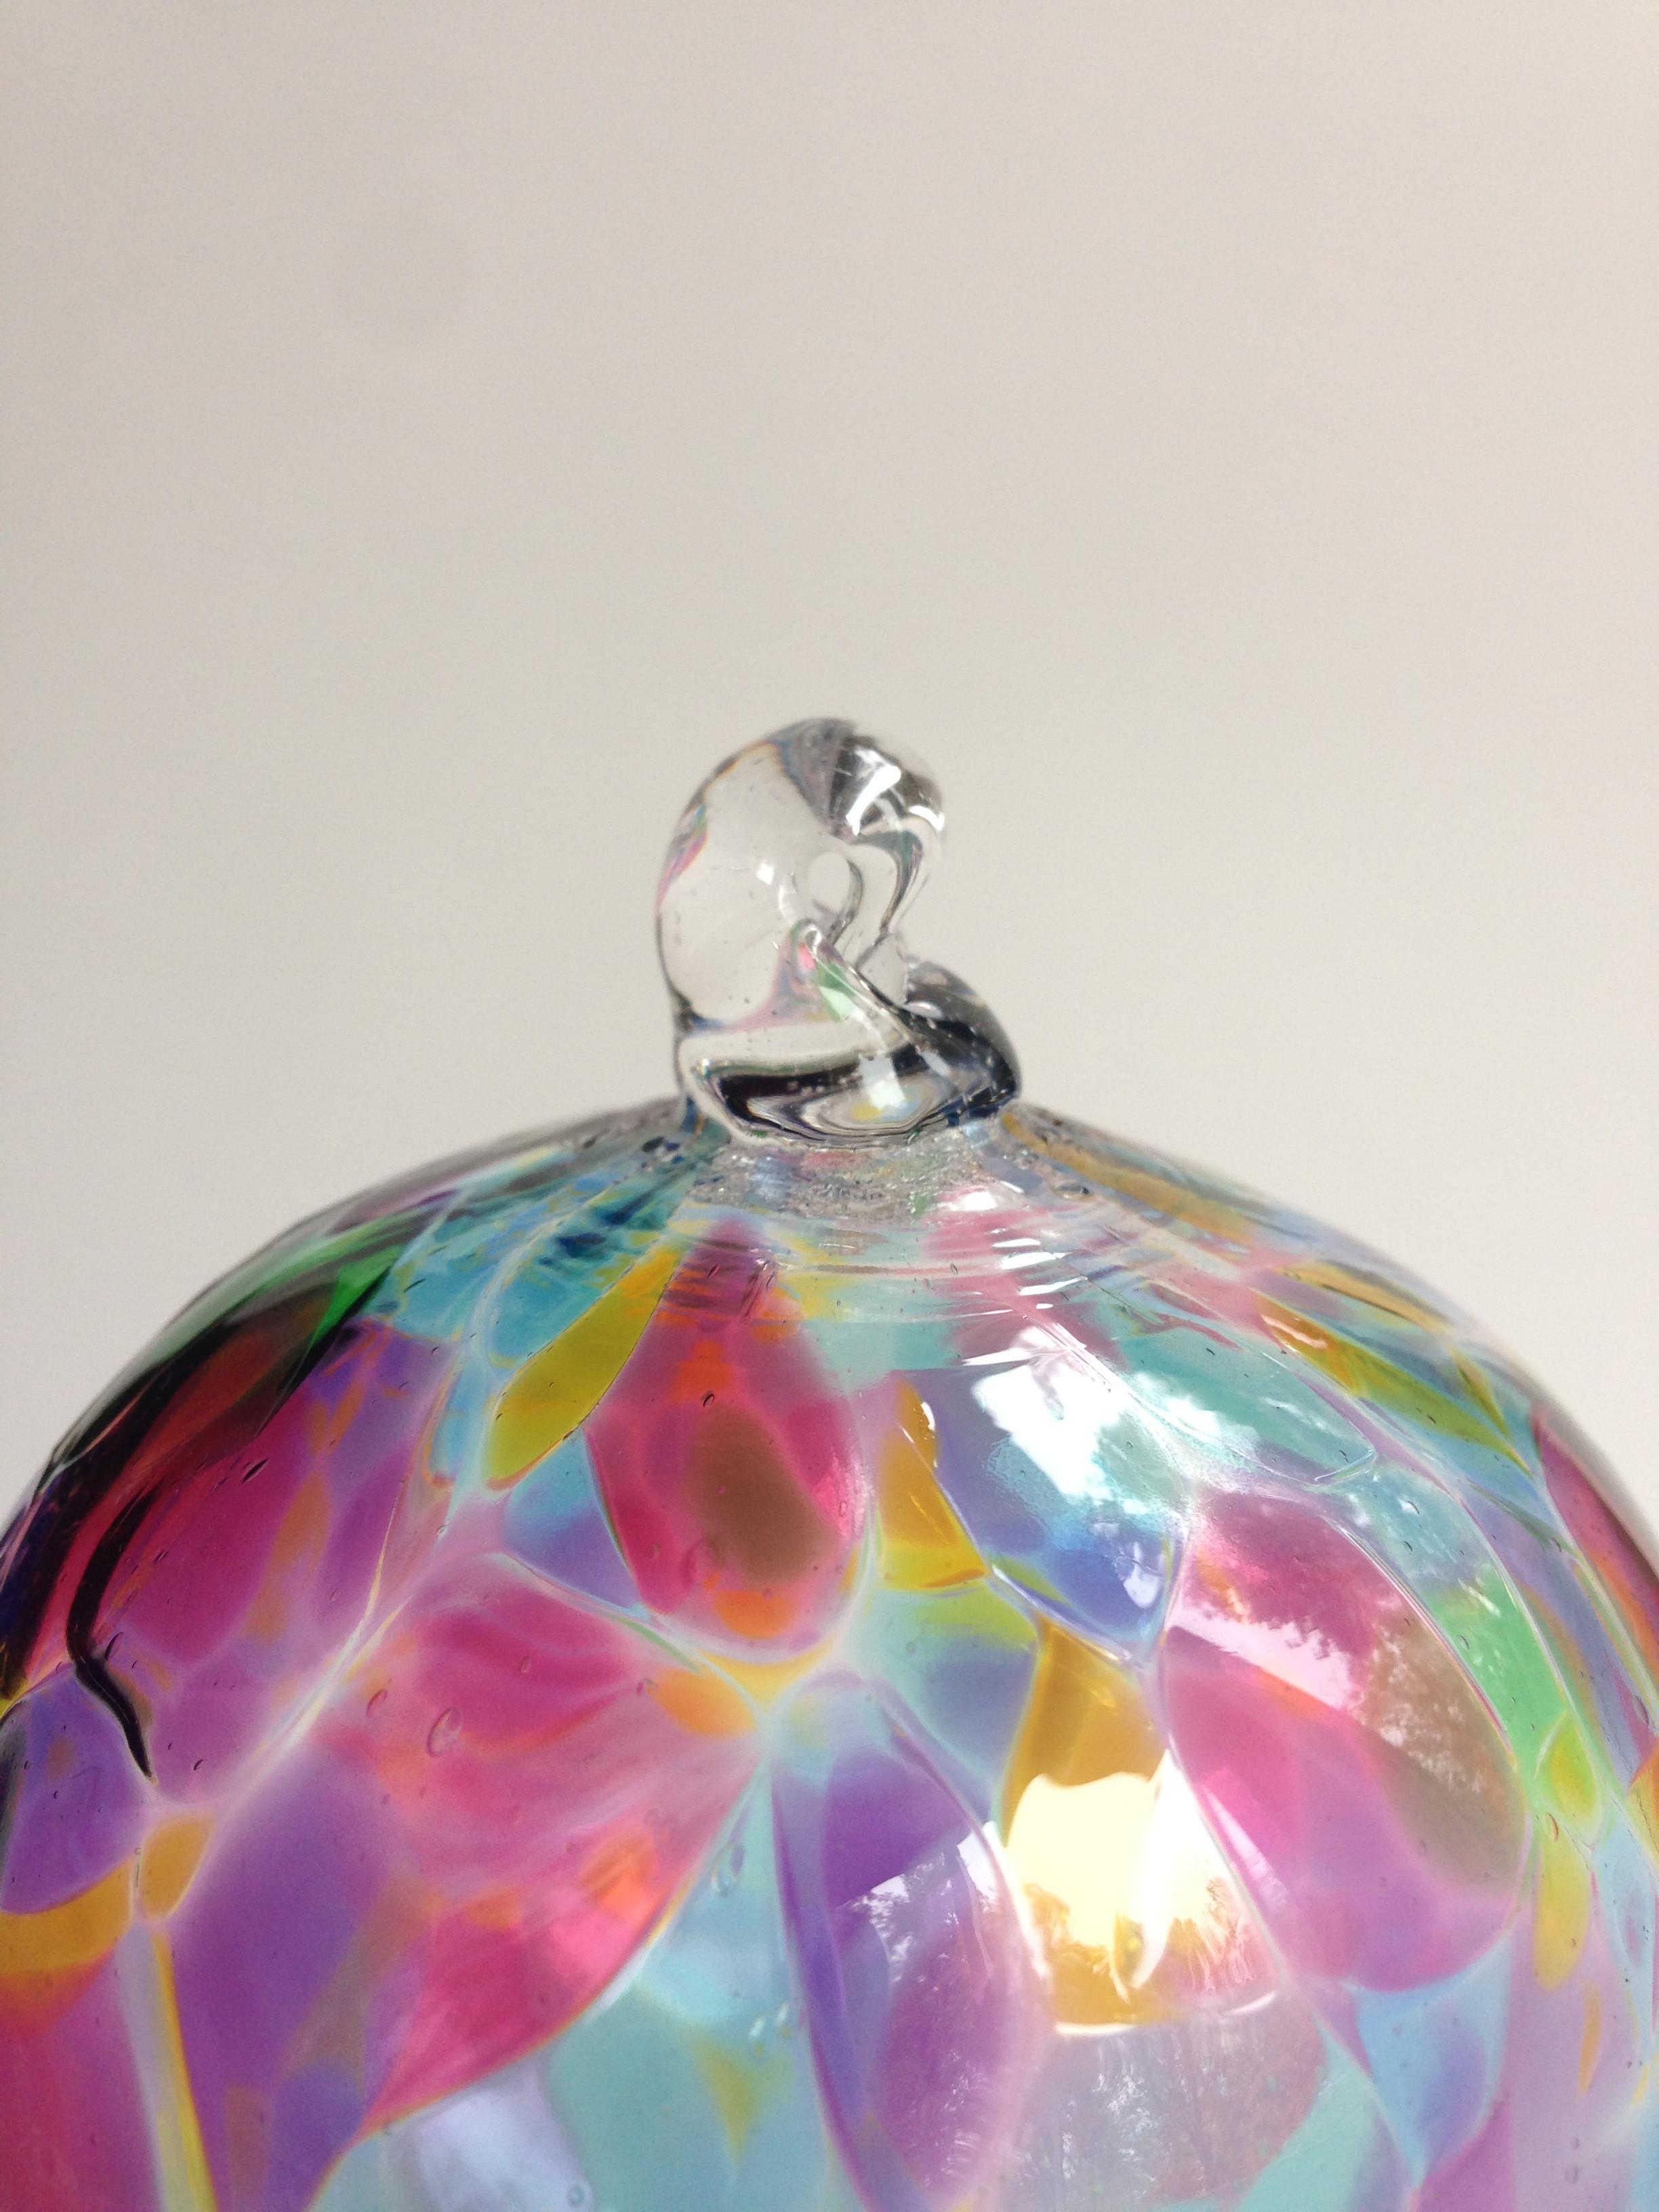 MAD Glassblowing; Orb Class